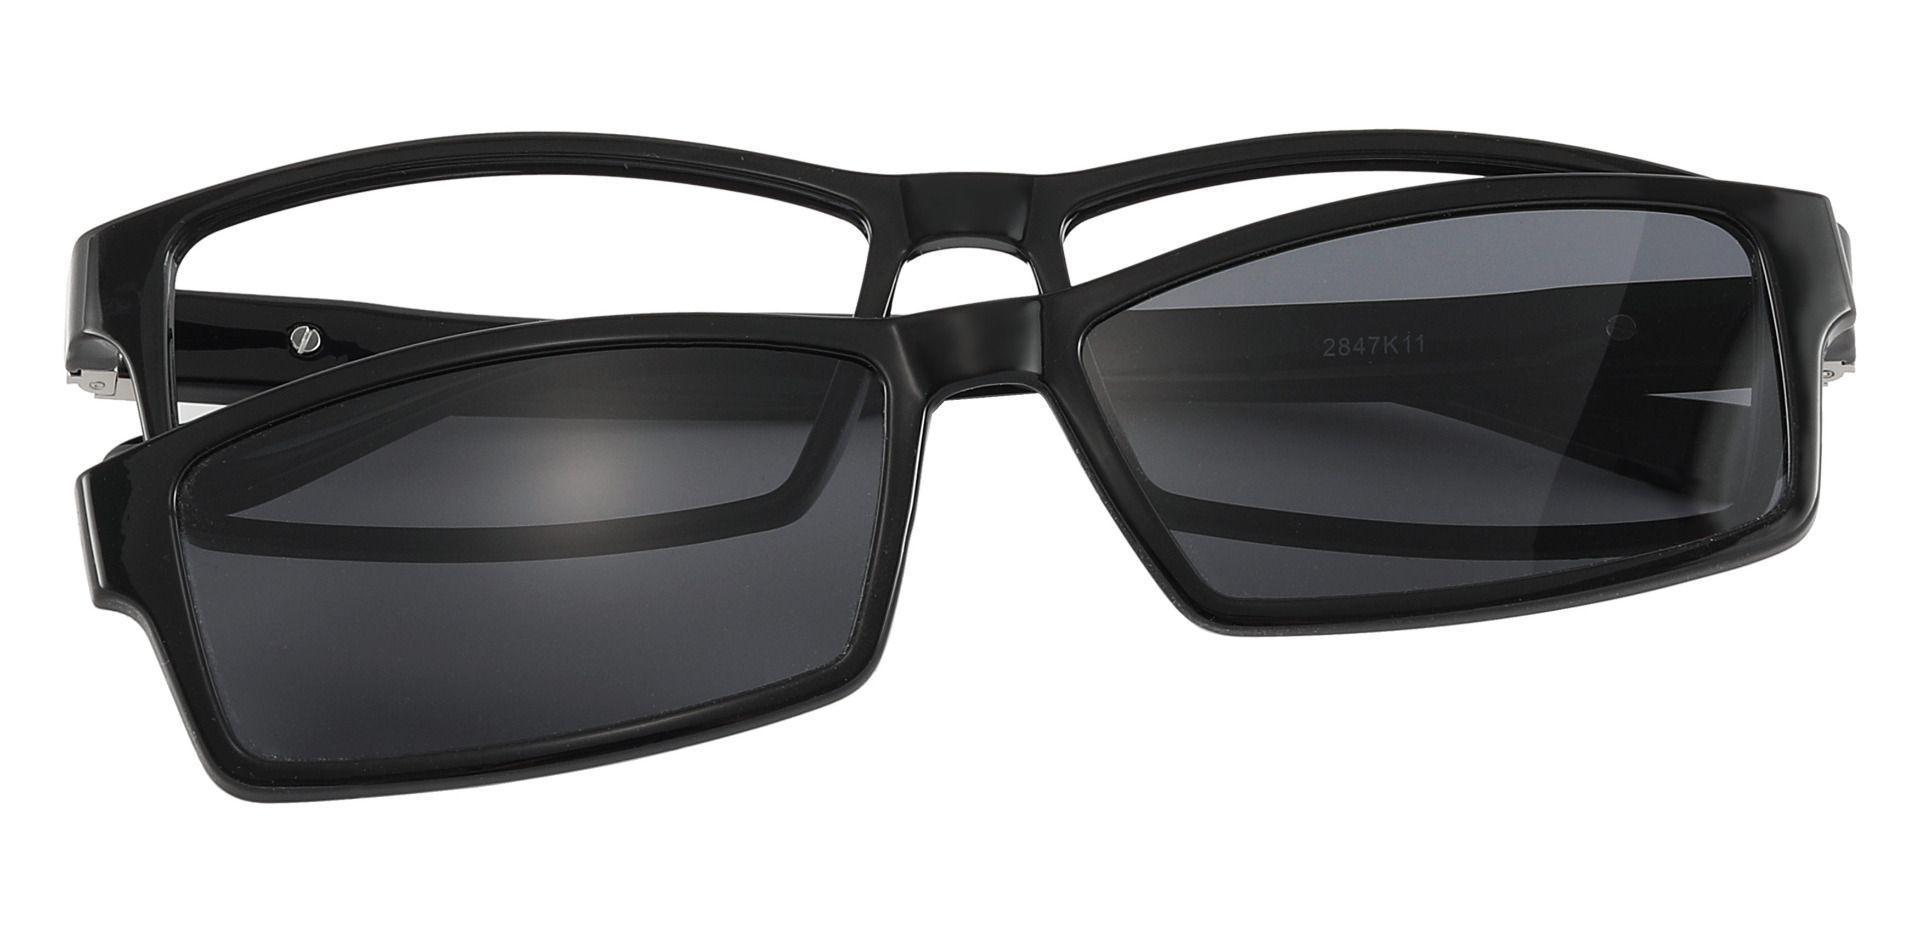 Dublin Rectangle Prescription Glasses - Black